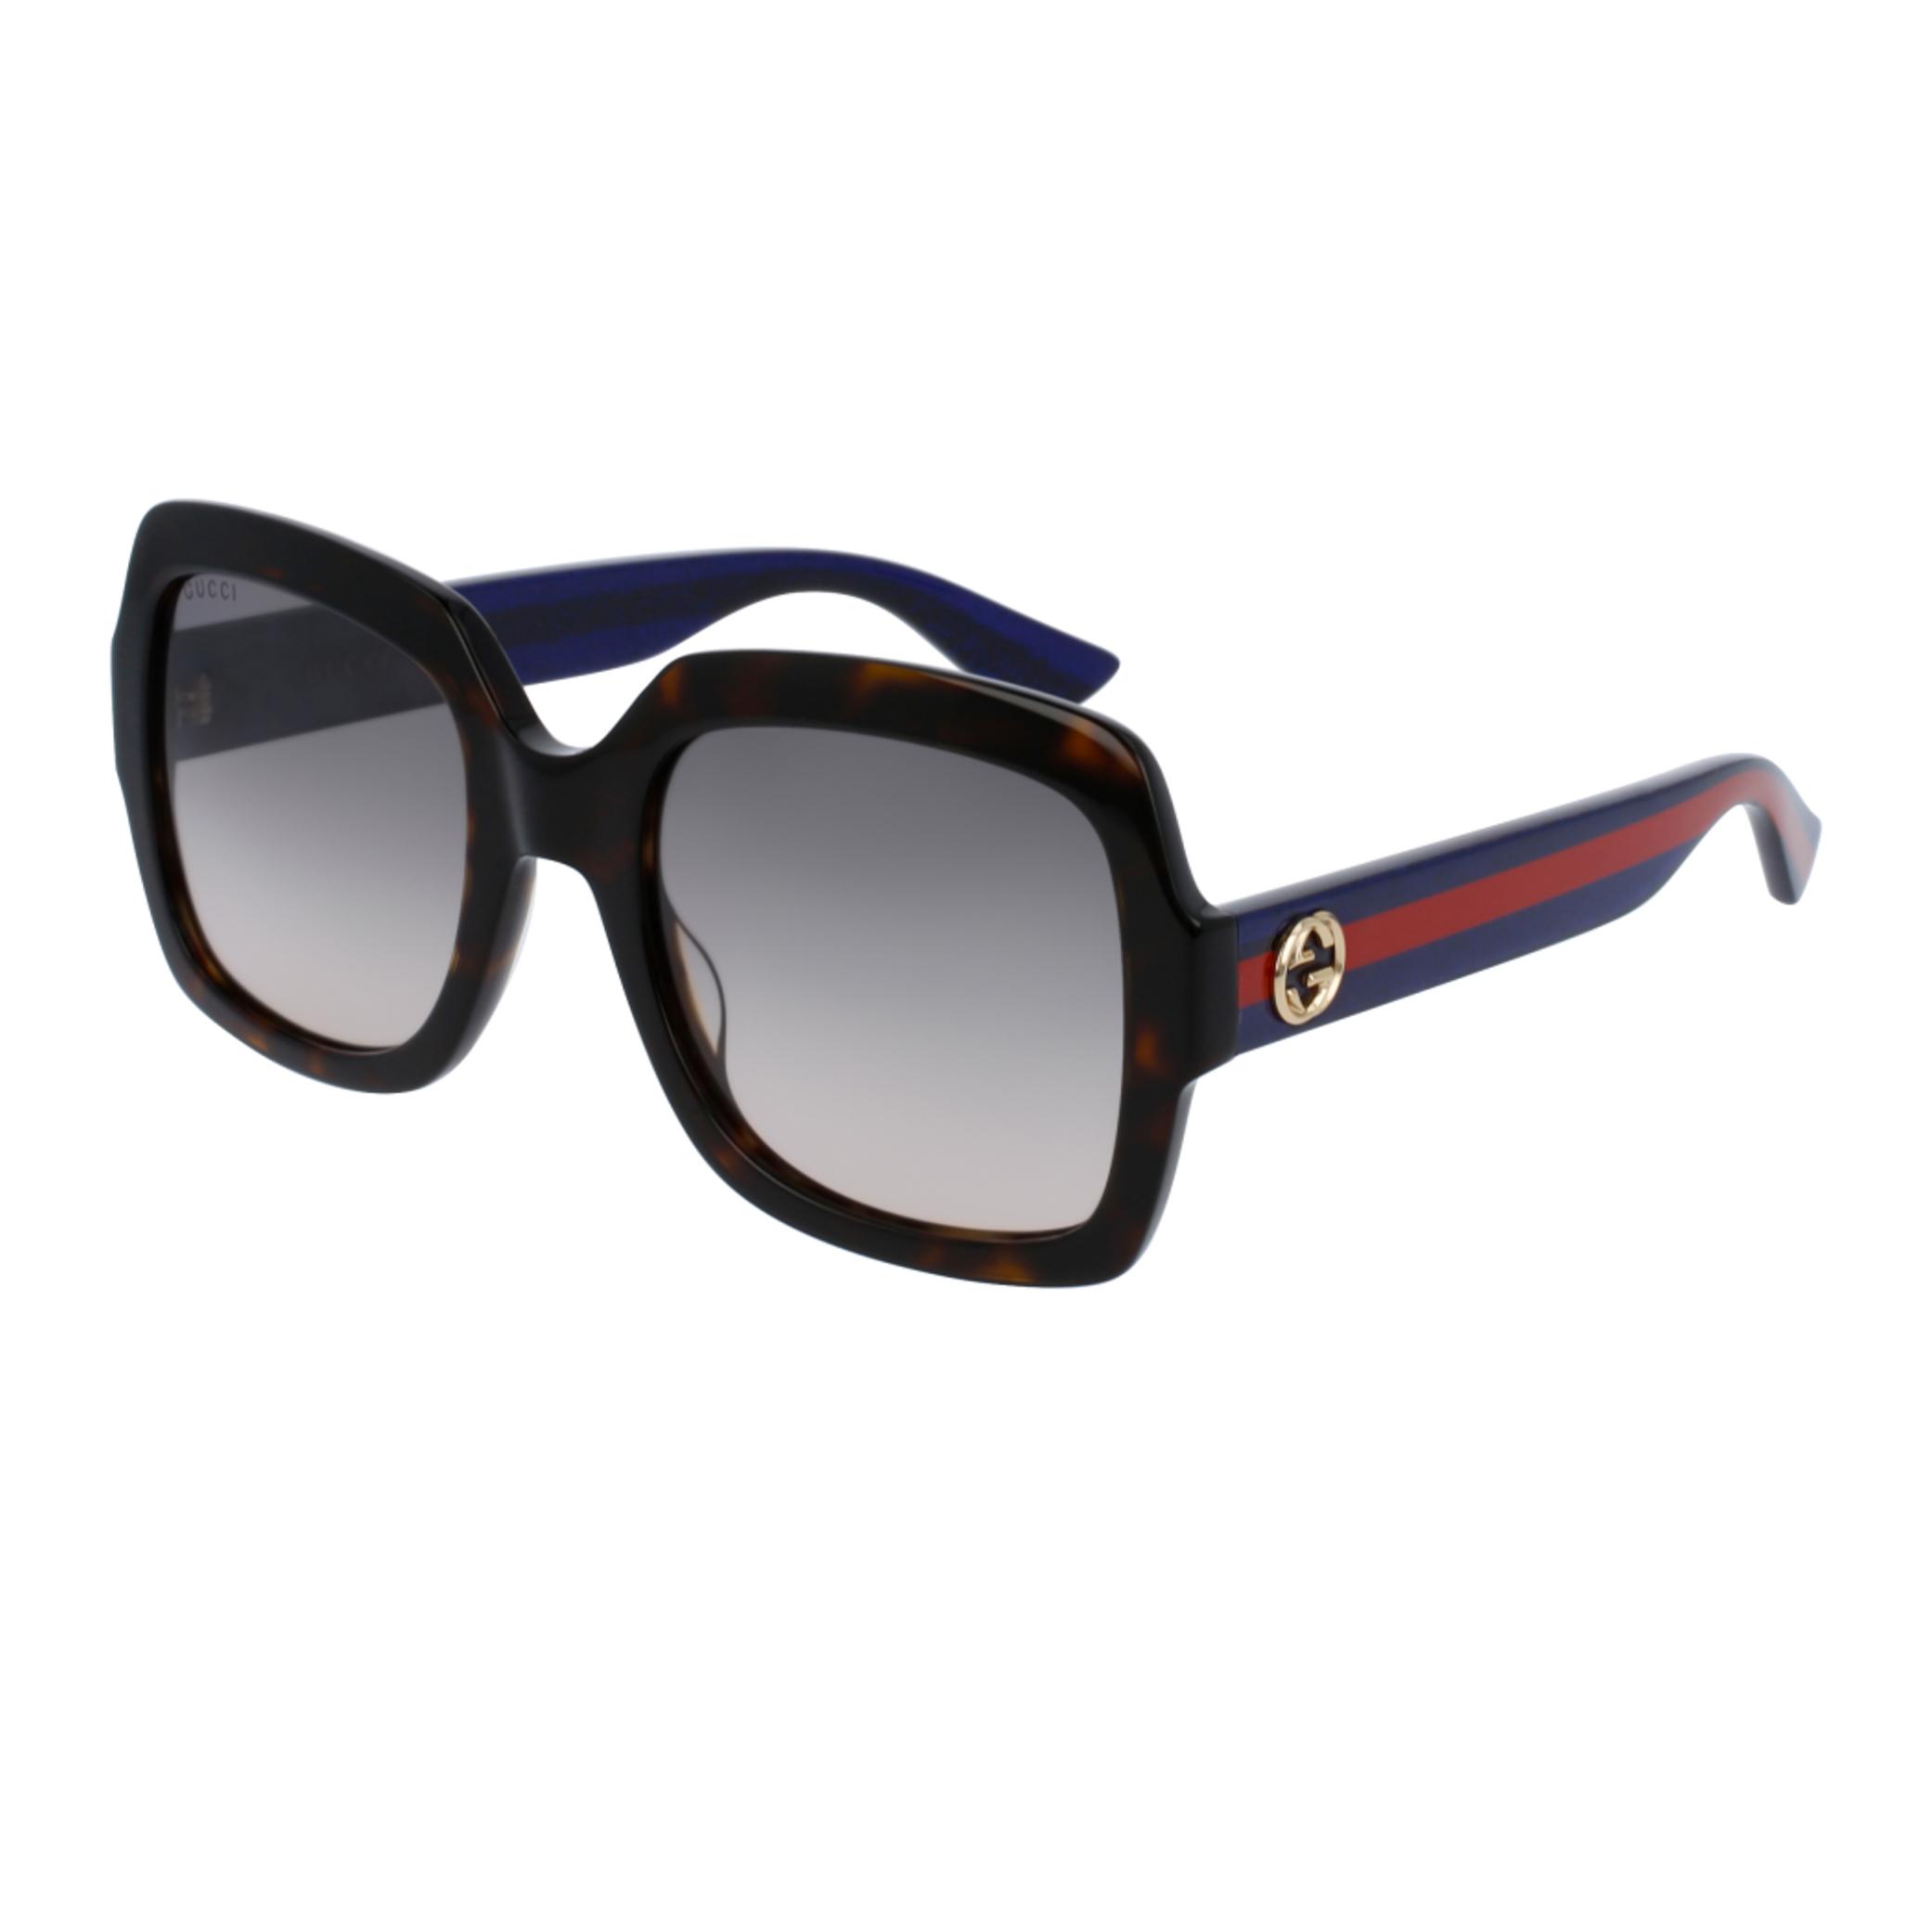 cb4c2394fb4 Shop online: Gucci zonnebrillen - GG 0036S - Optiek Lammerant